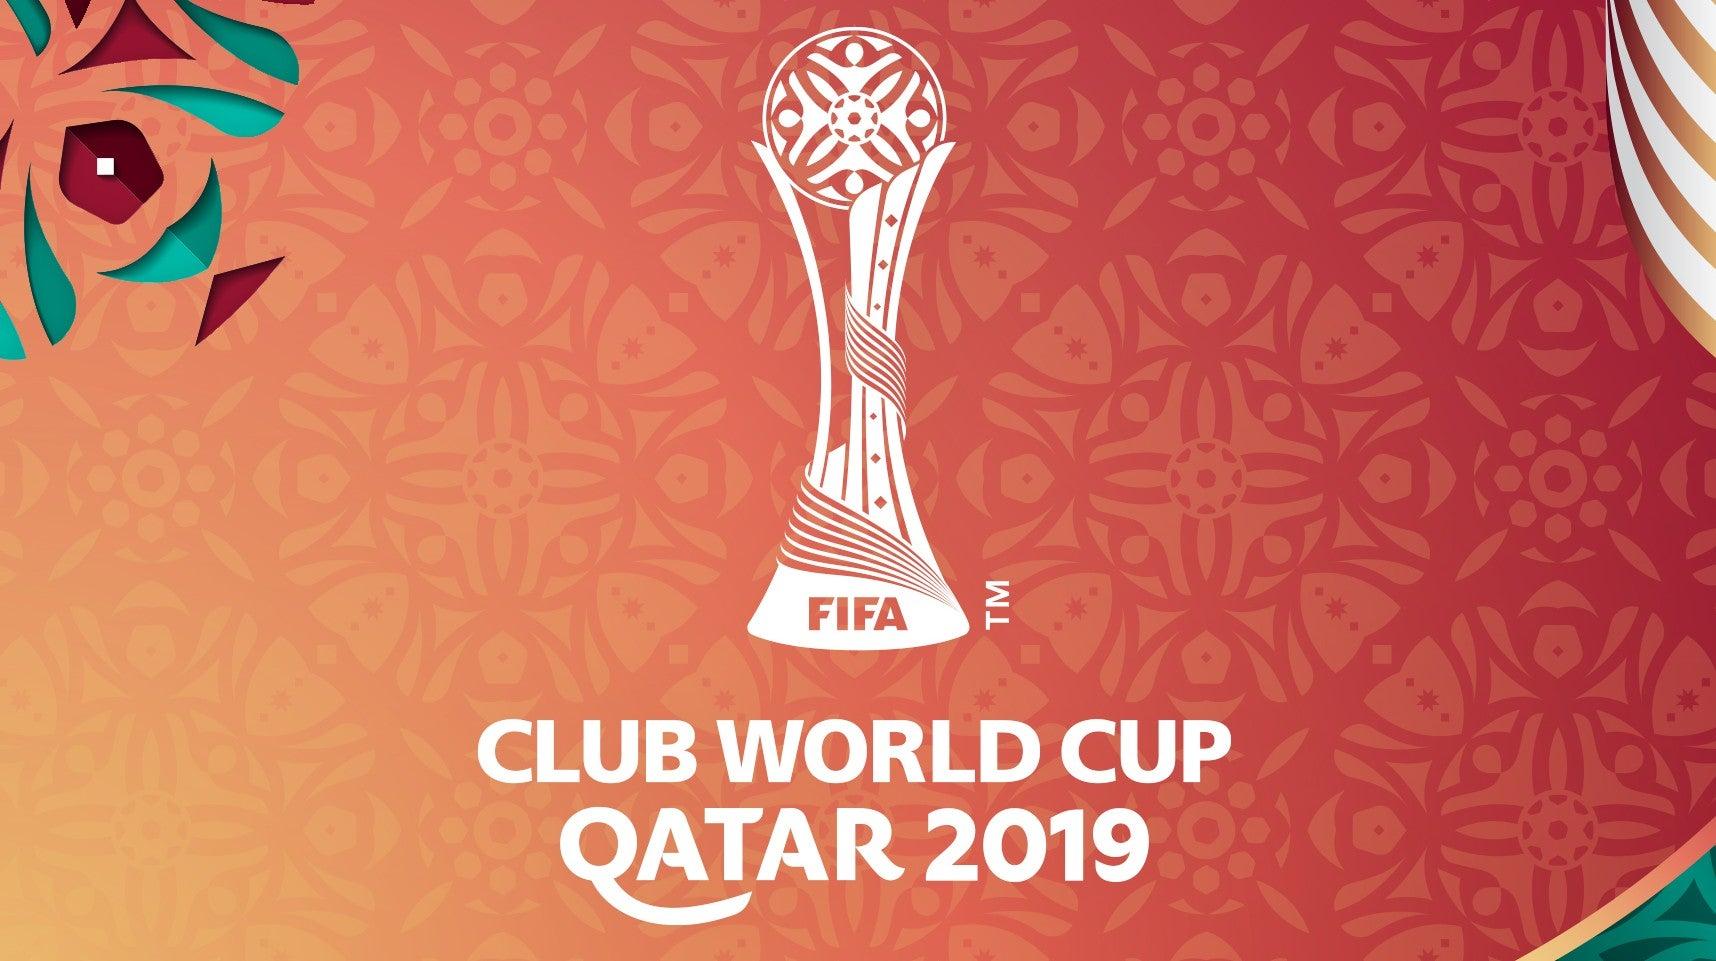 FIFA Campeonato do Mundo de Clubes 2019